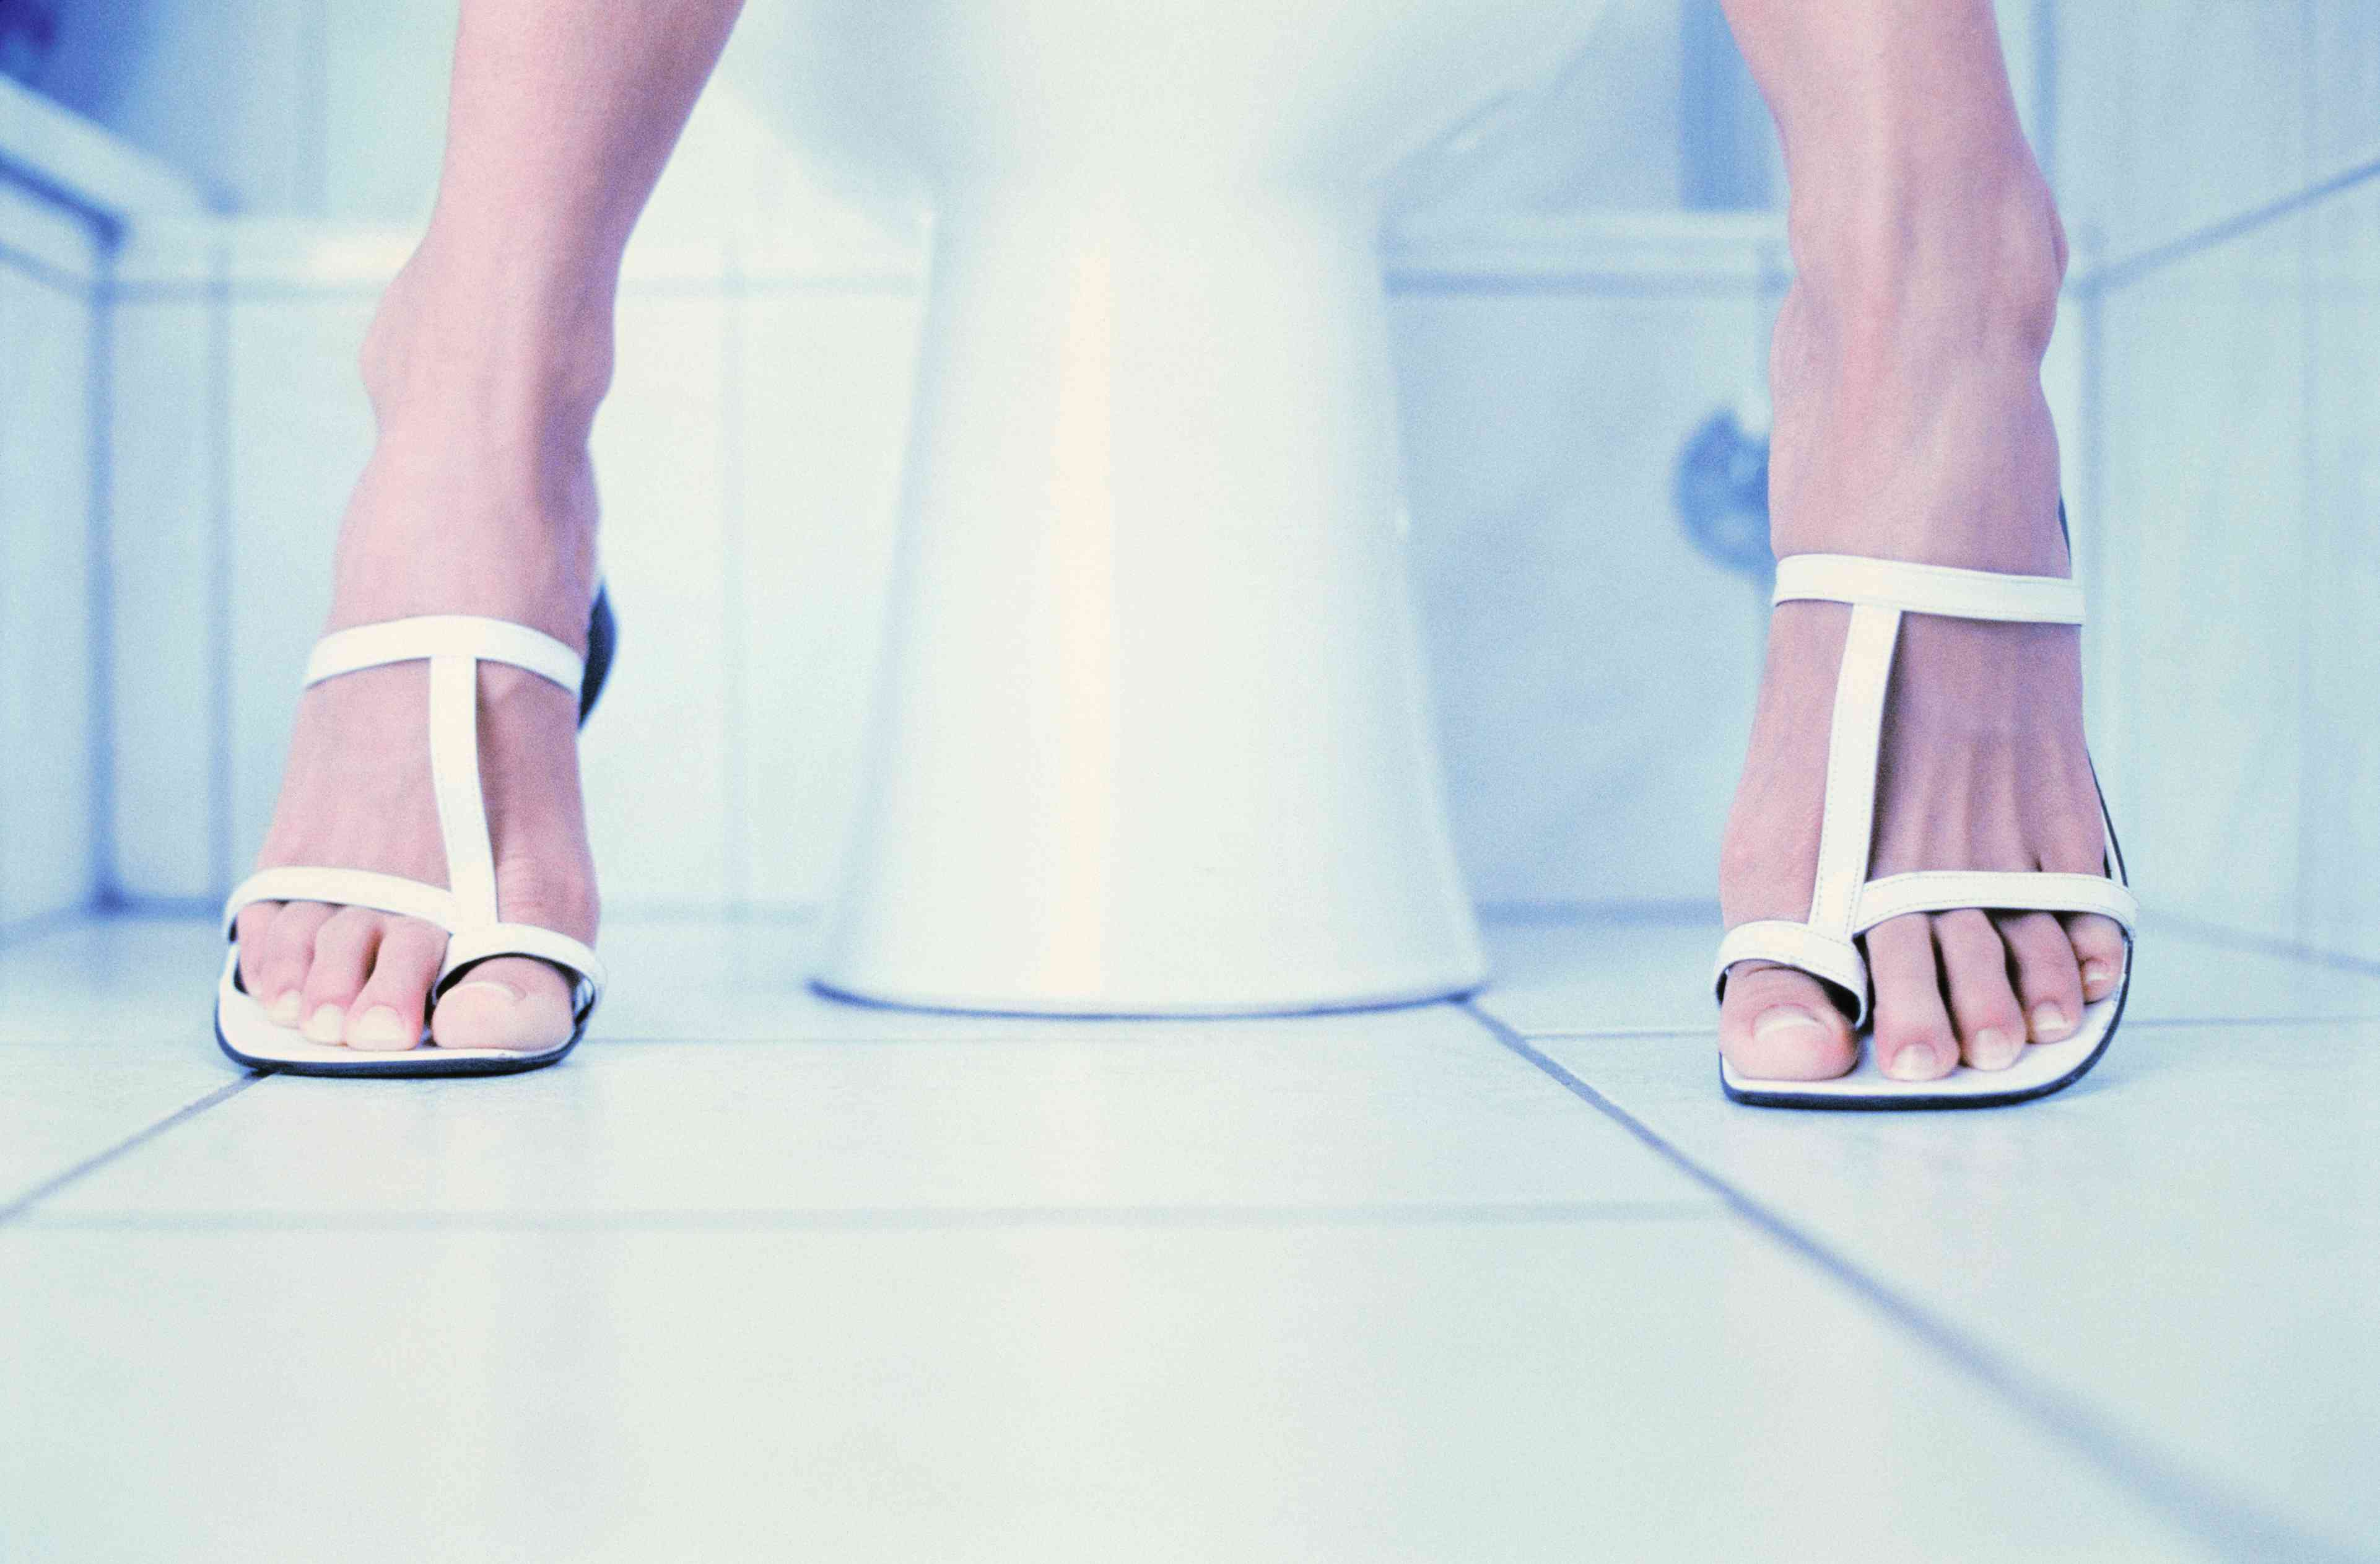 Woman's feet next to toilet in bathroom